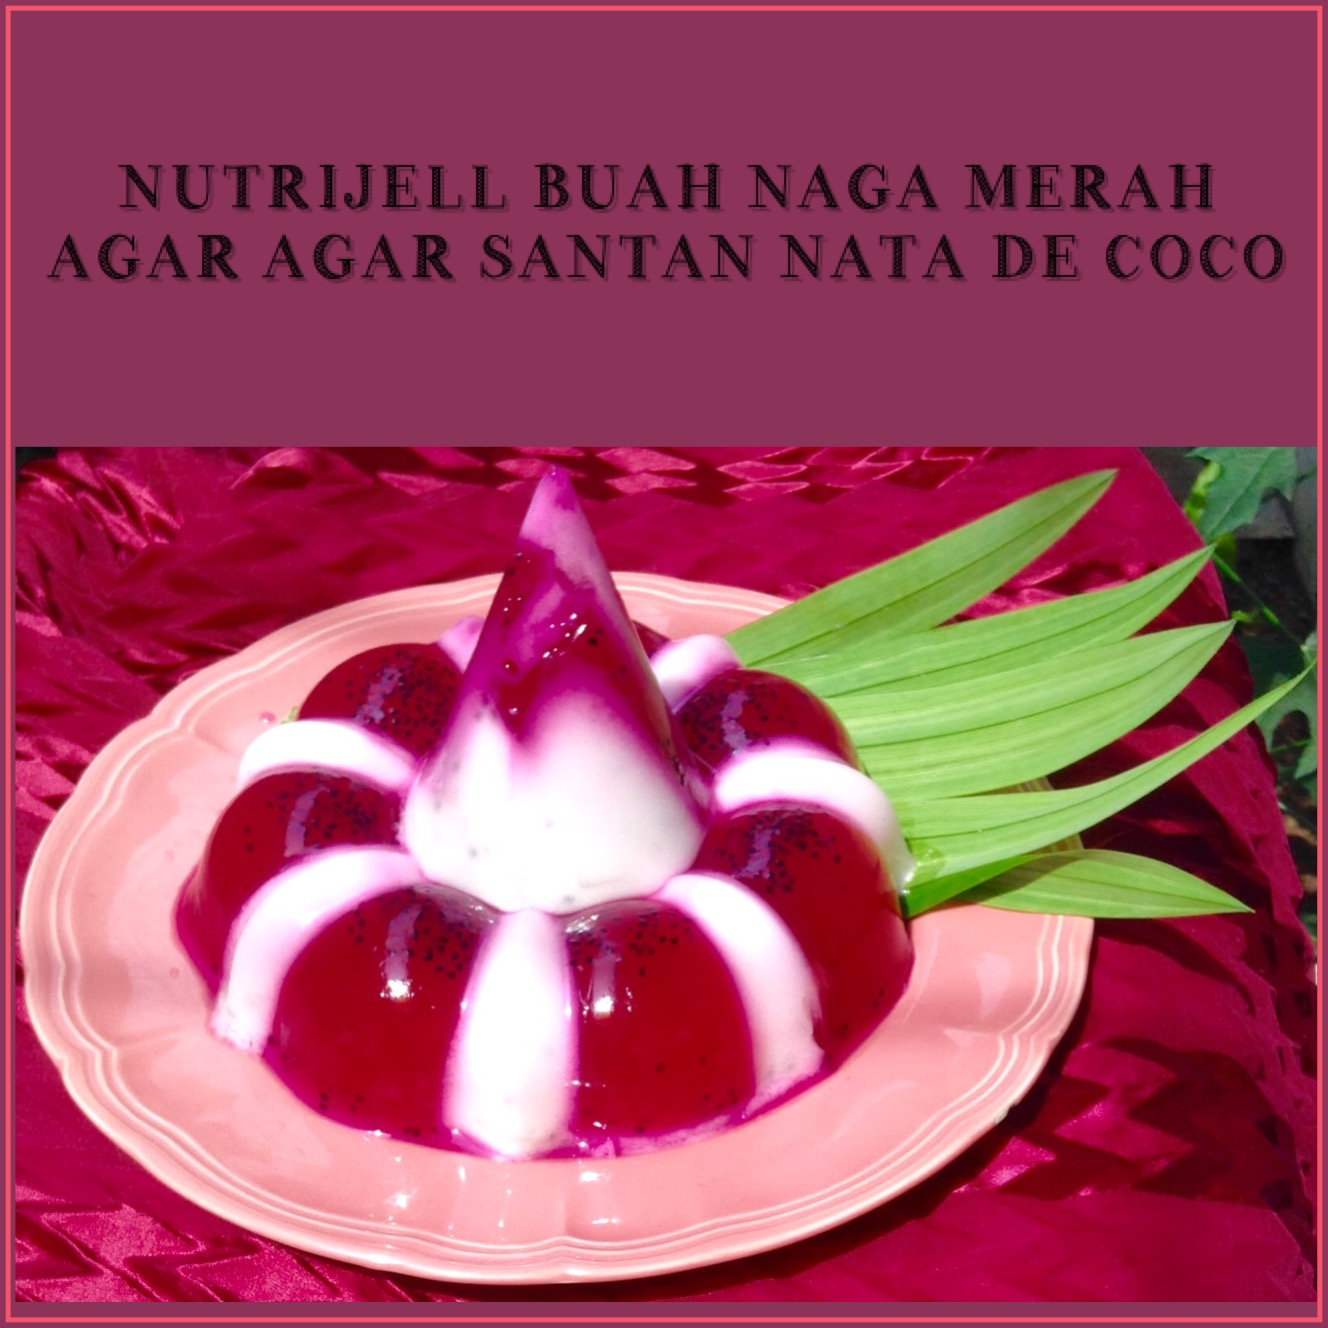 Resep Nutrijell Buah Naga Merah dan Agar Agar Santan Nata de Coco